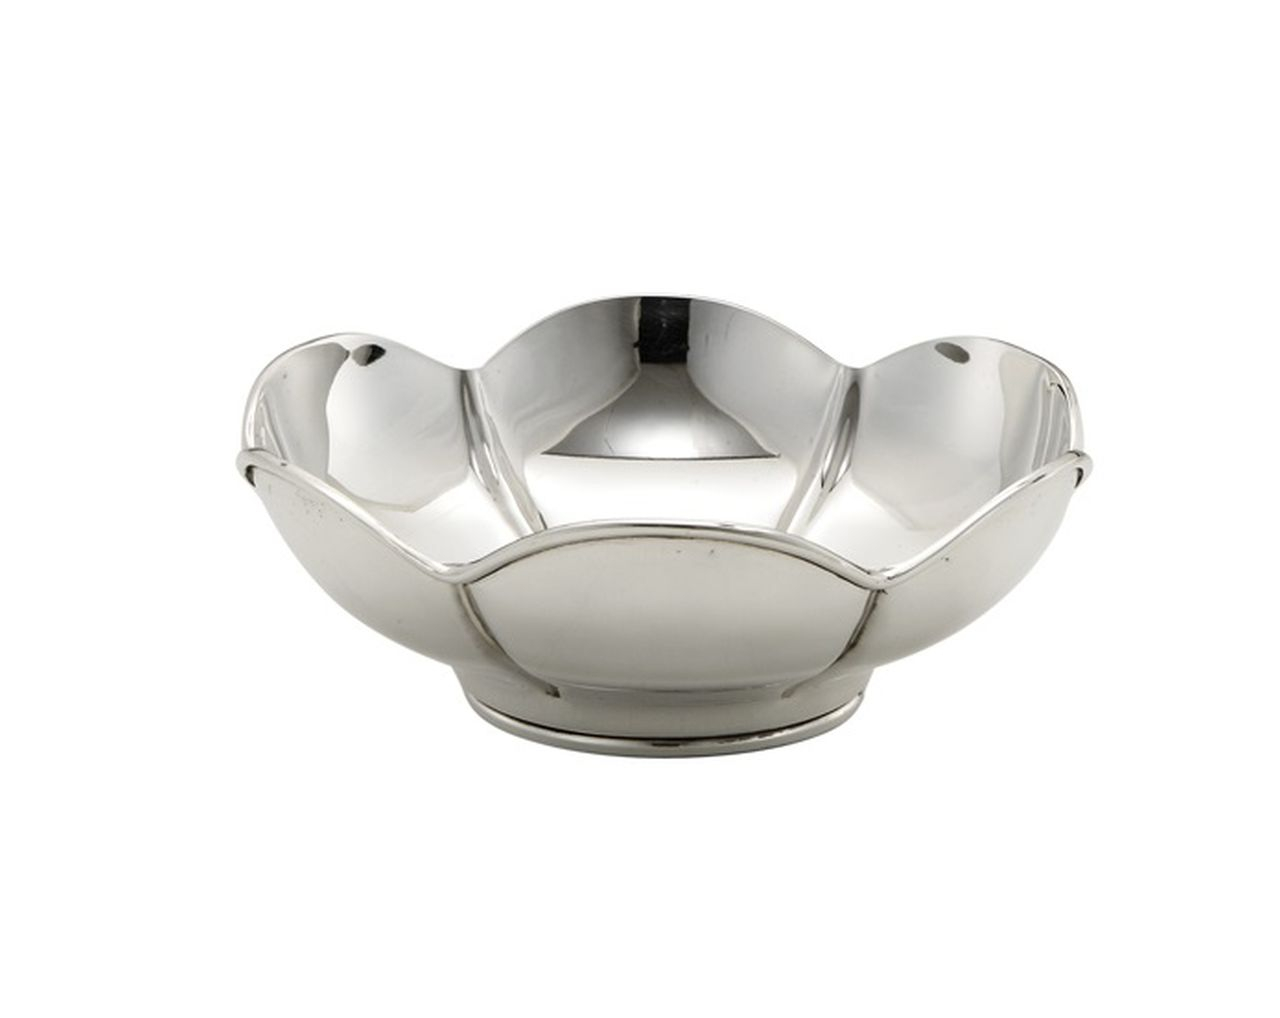 Ciotola argentata argento sheffield cm.6,5h diam.17